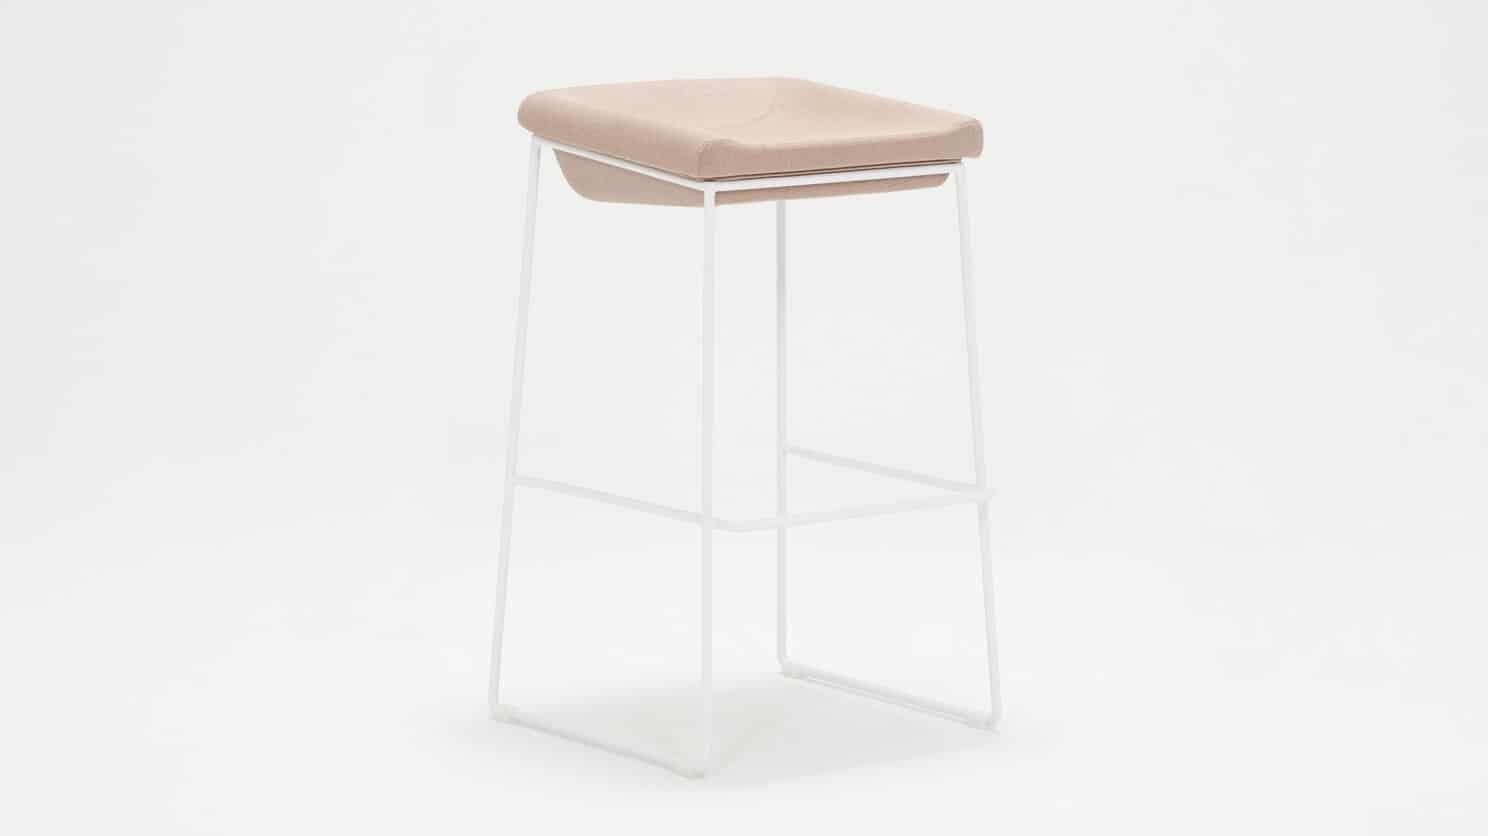 3020 266 par 9 counter chairs mackenzie bar stool taupe seat white base corner 01 1